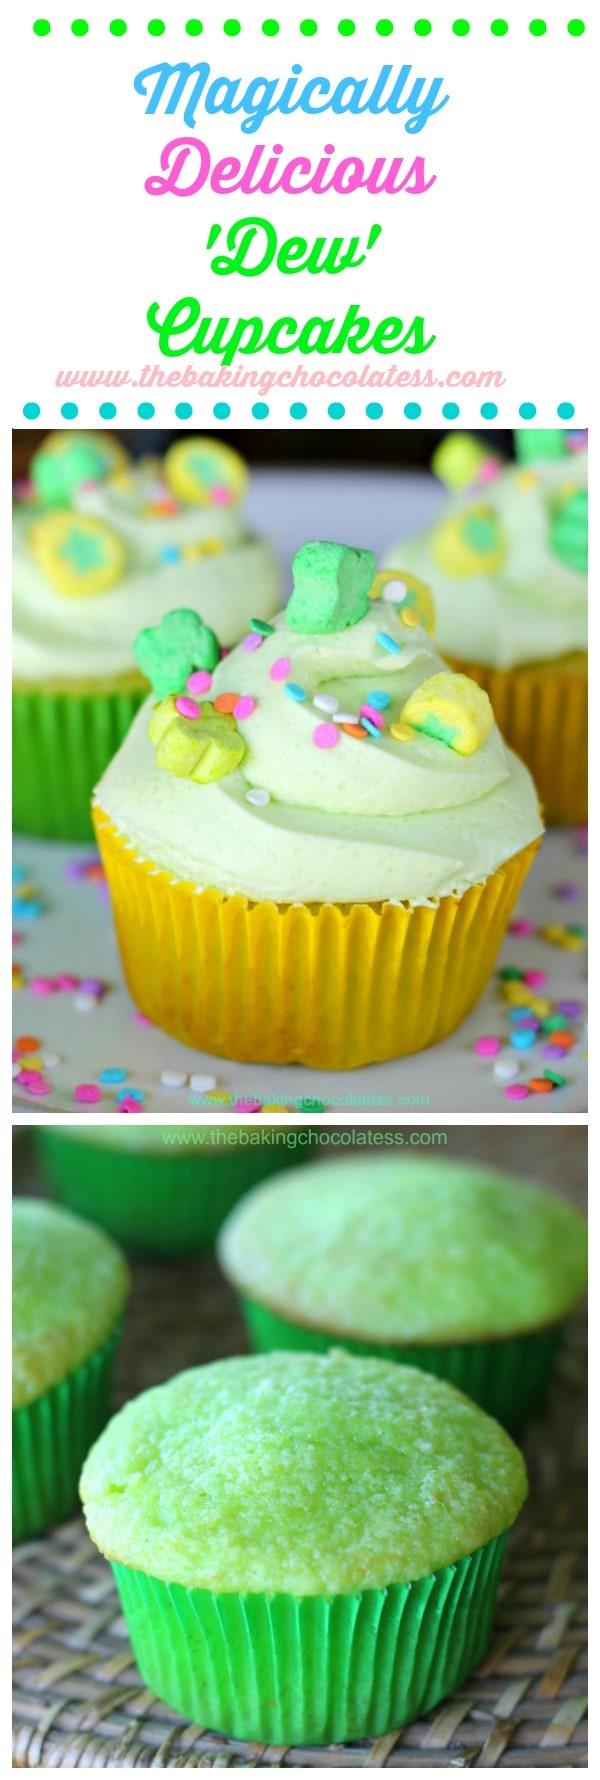 Magically Delicious \'Dew\' Cupcakes Recipe